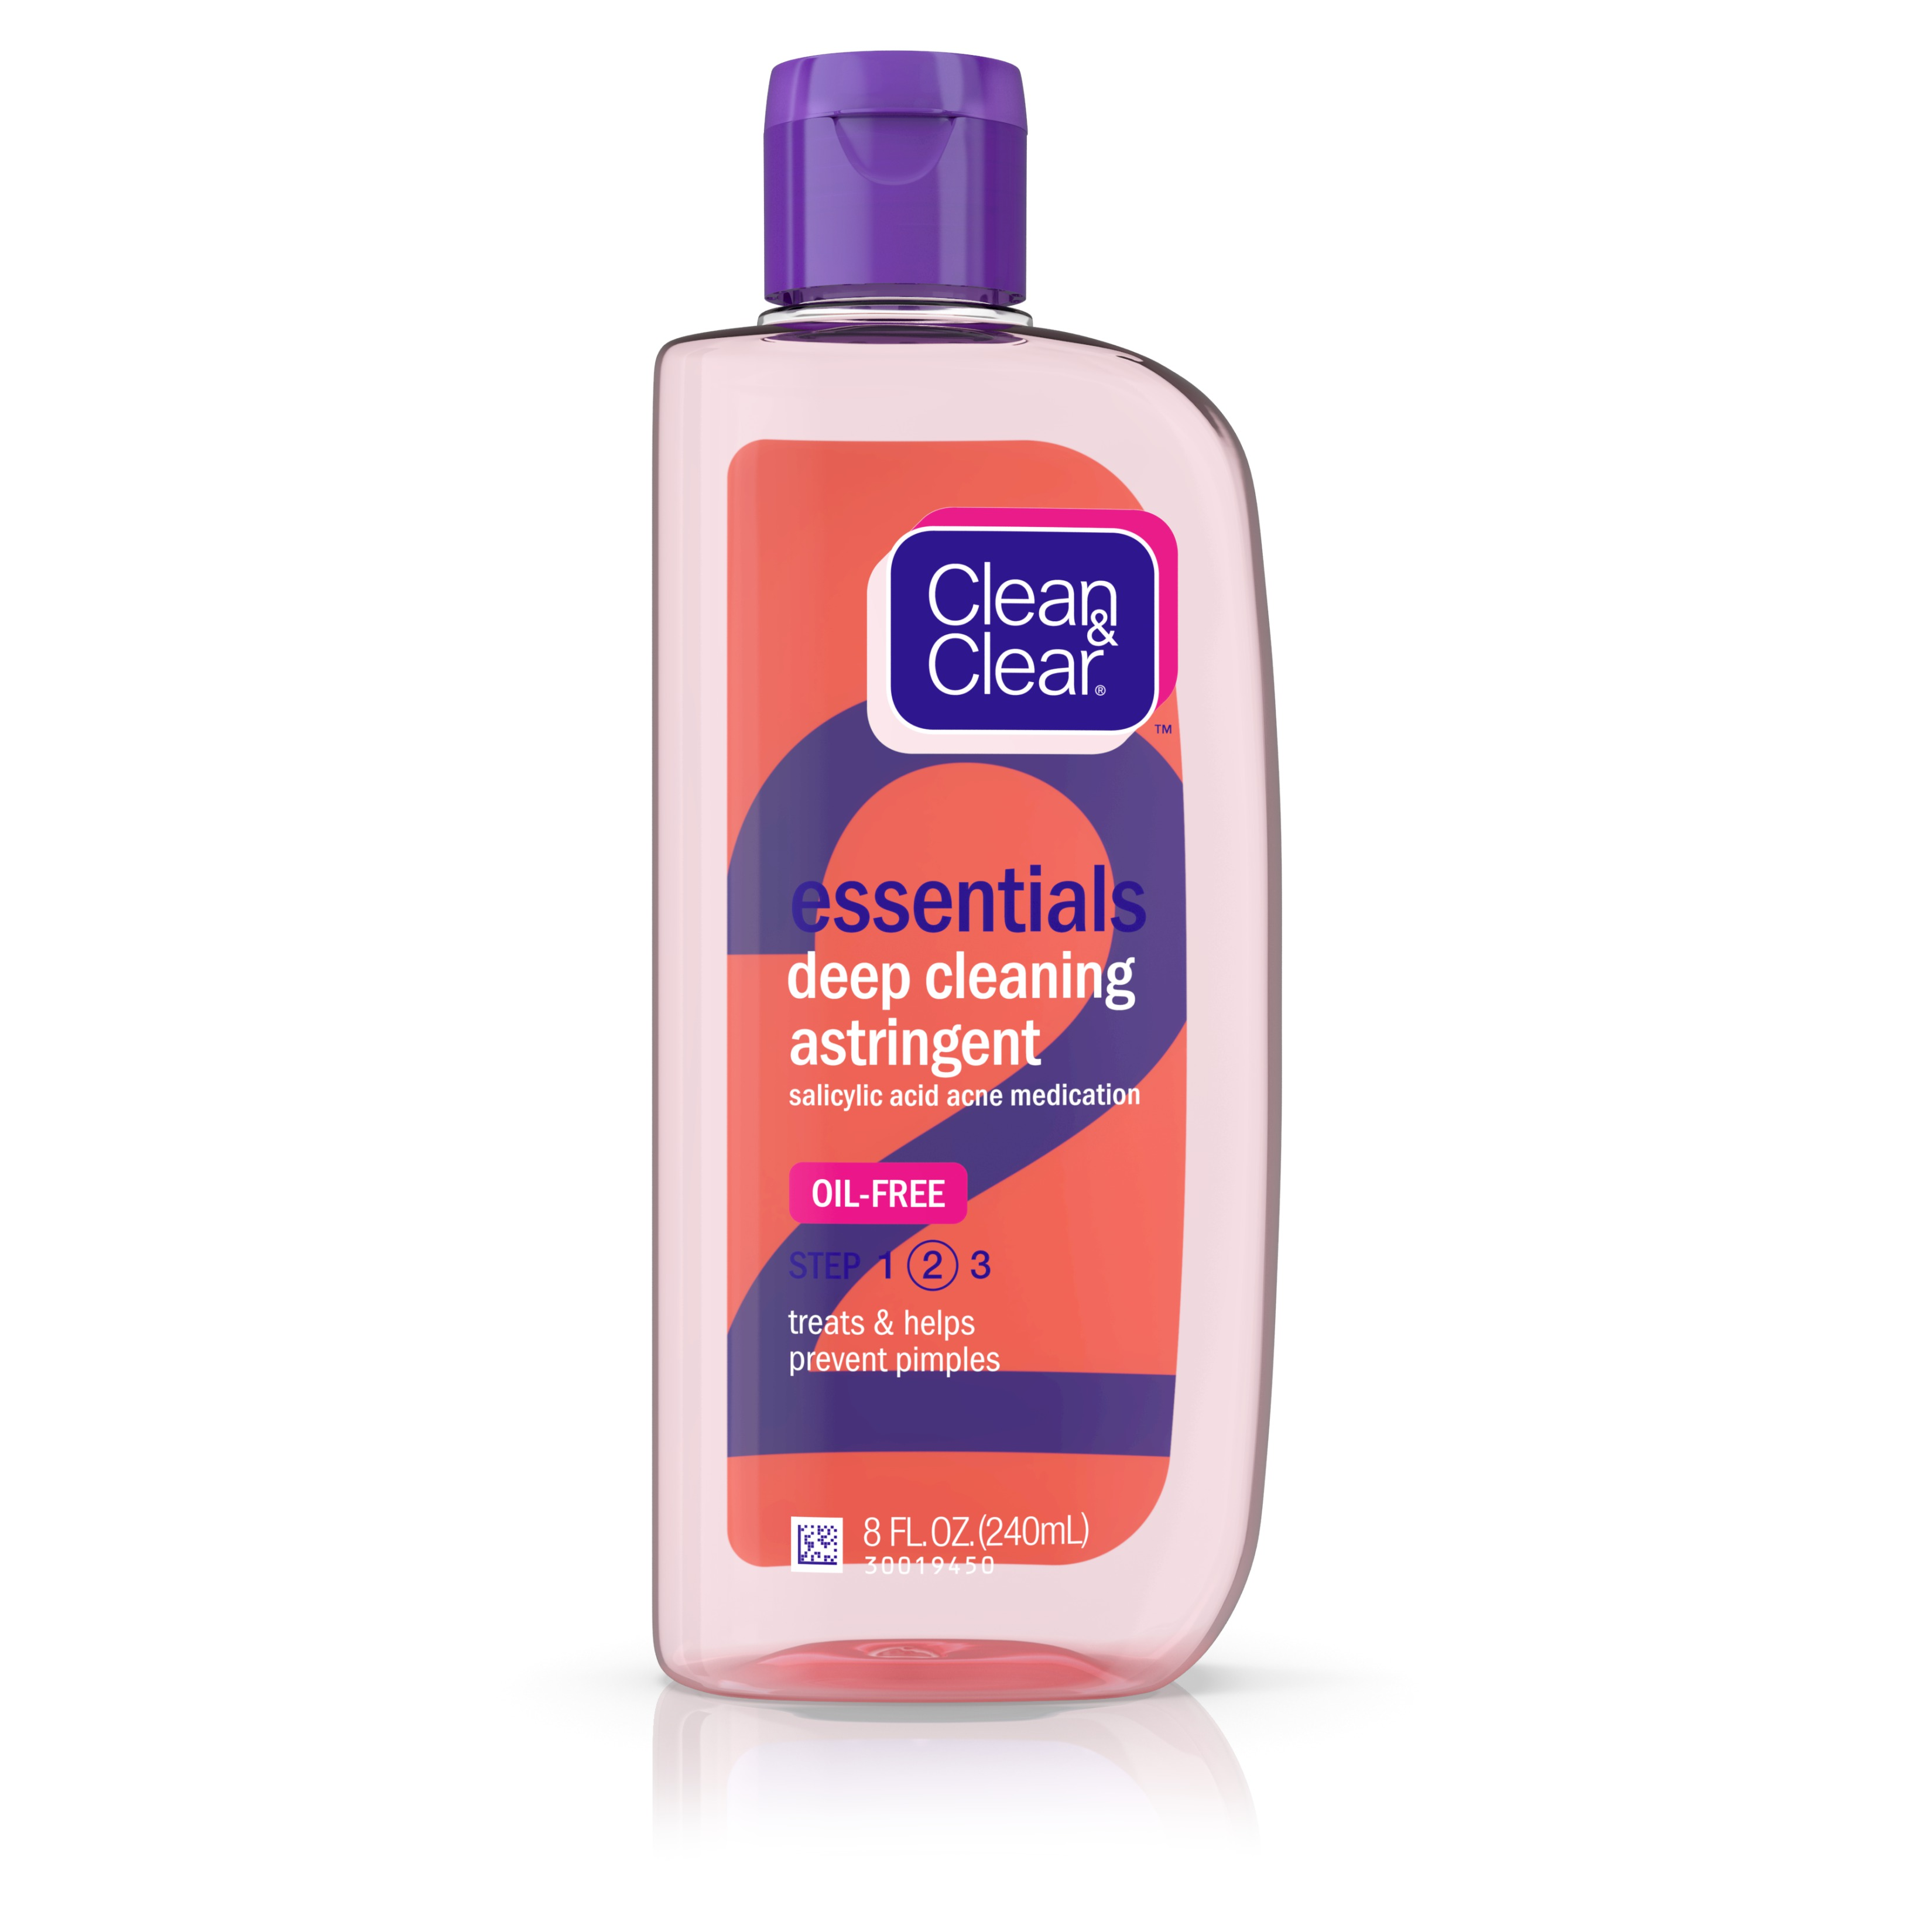 Clean & Clear Essentials Deep Cleaning Astringent,  8 Fl. Oz - Walmart.com